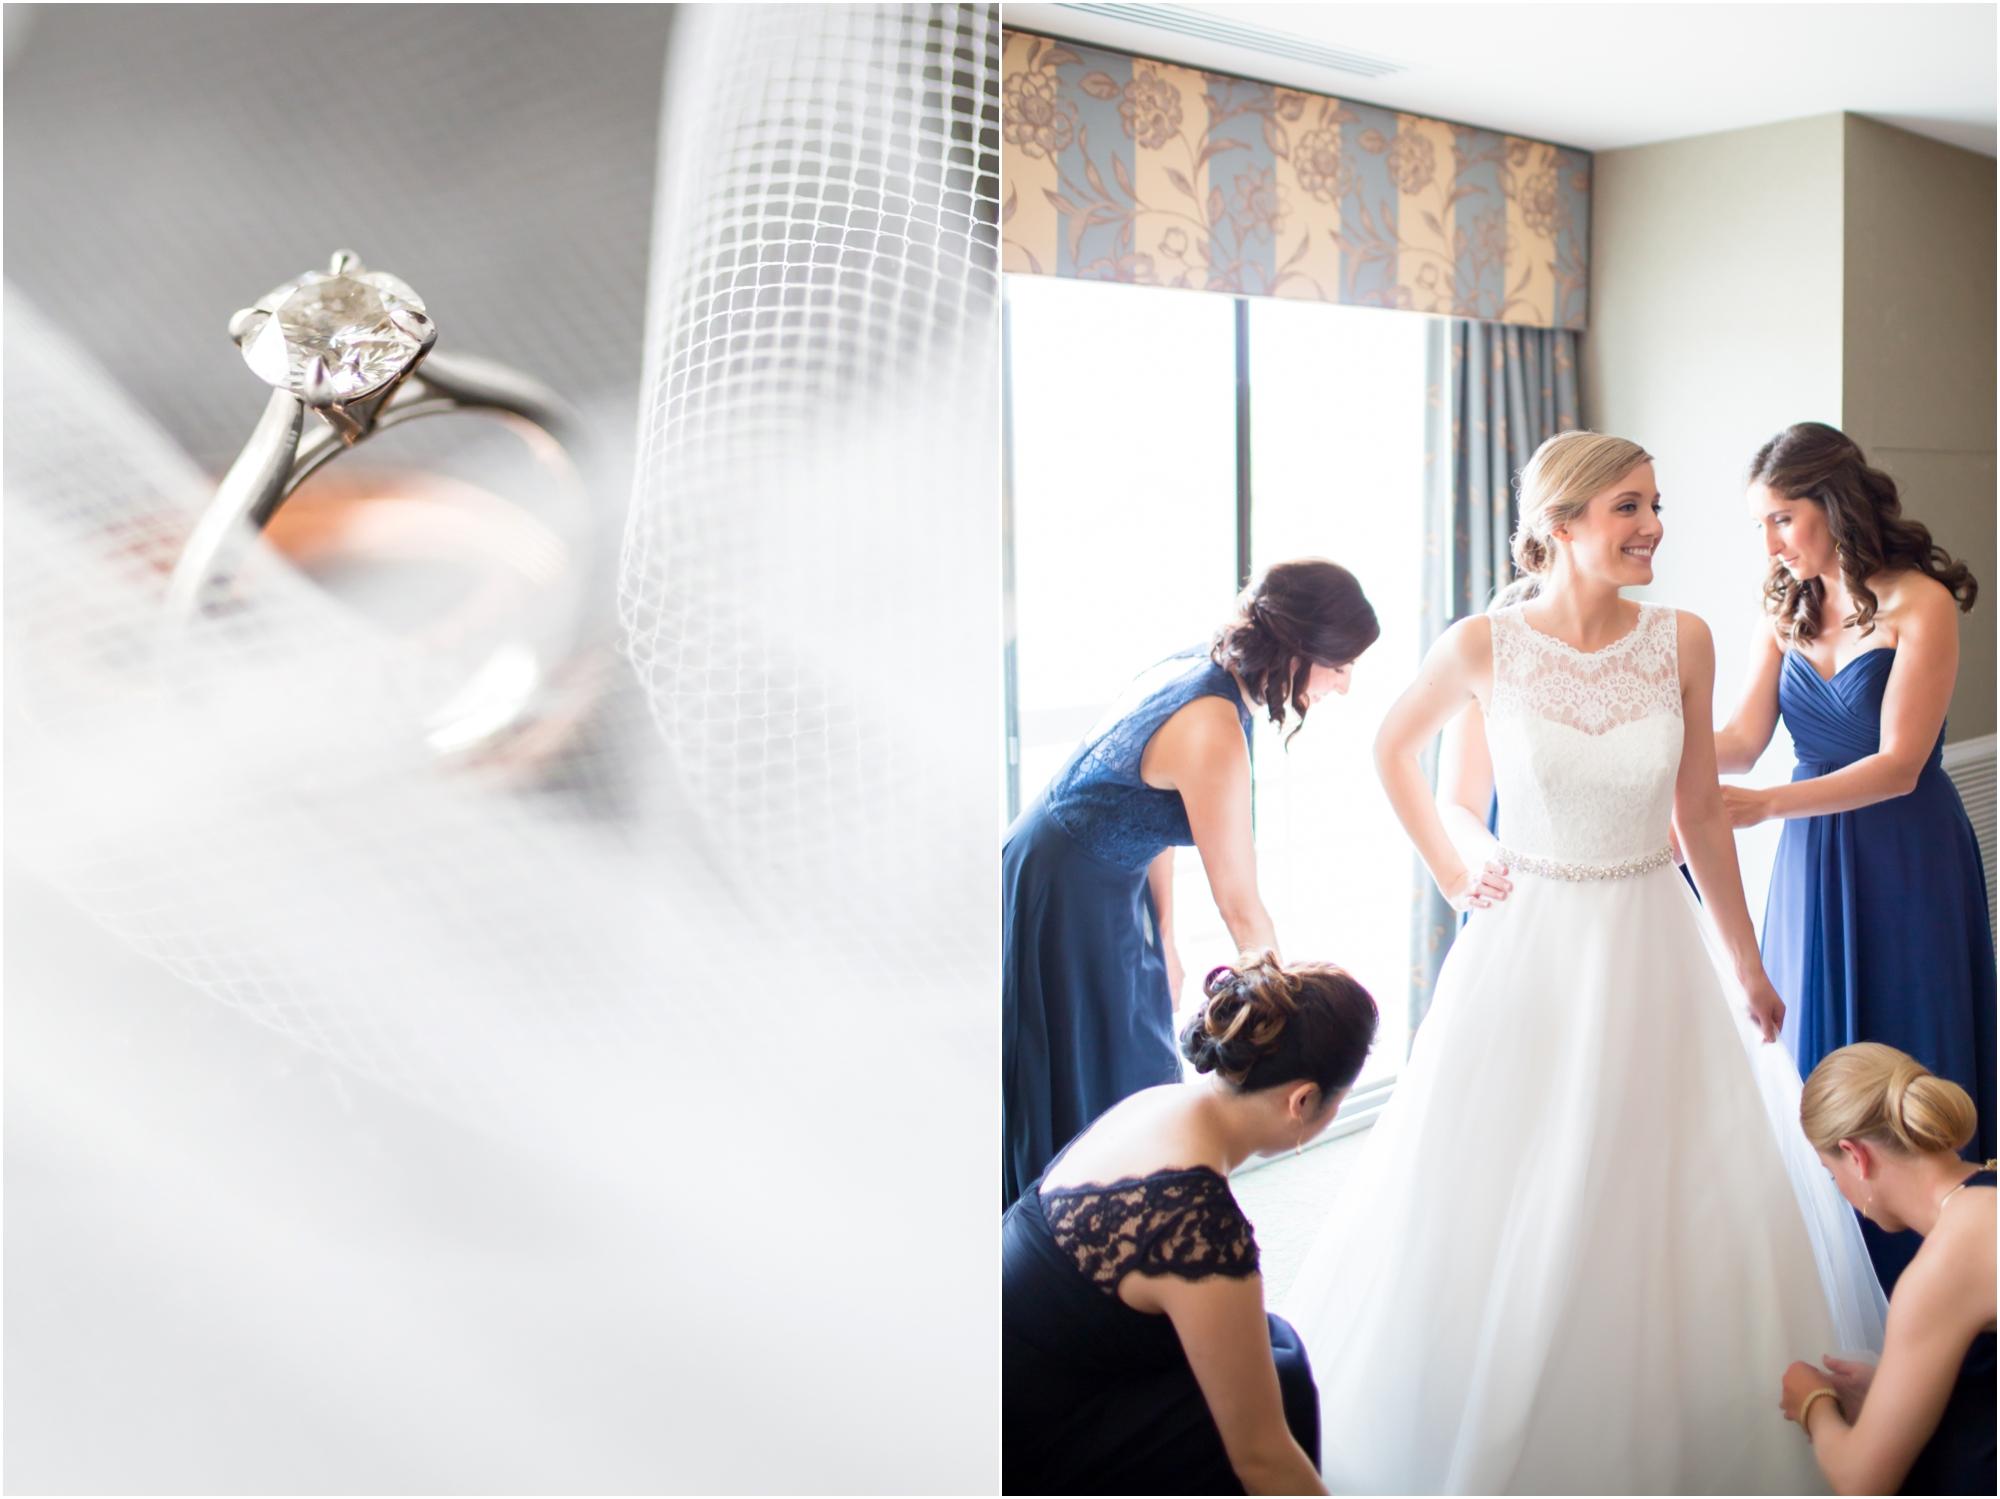 1-Finkel Wedding Getting Ready-100_anna grace photography maryland wedding photographer turf valley.jpg